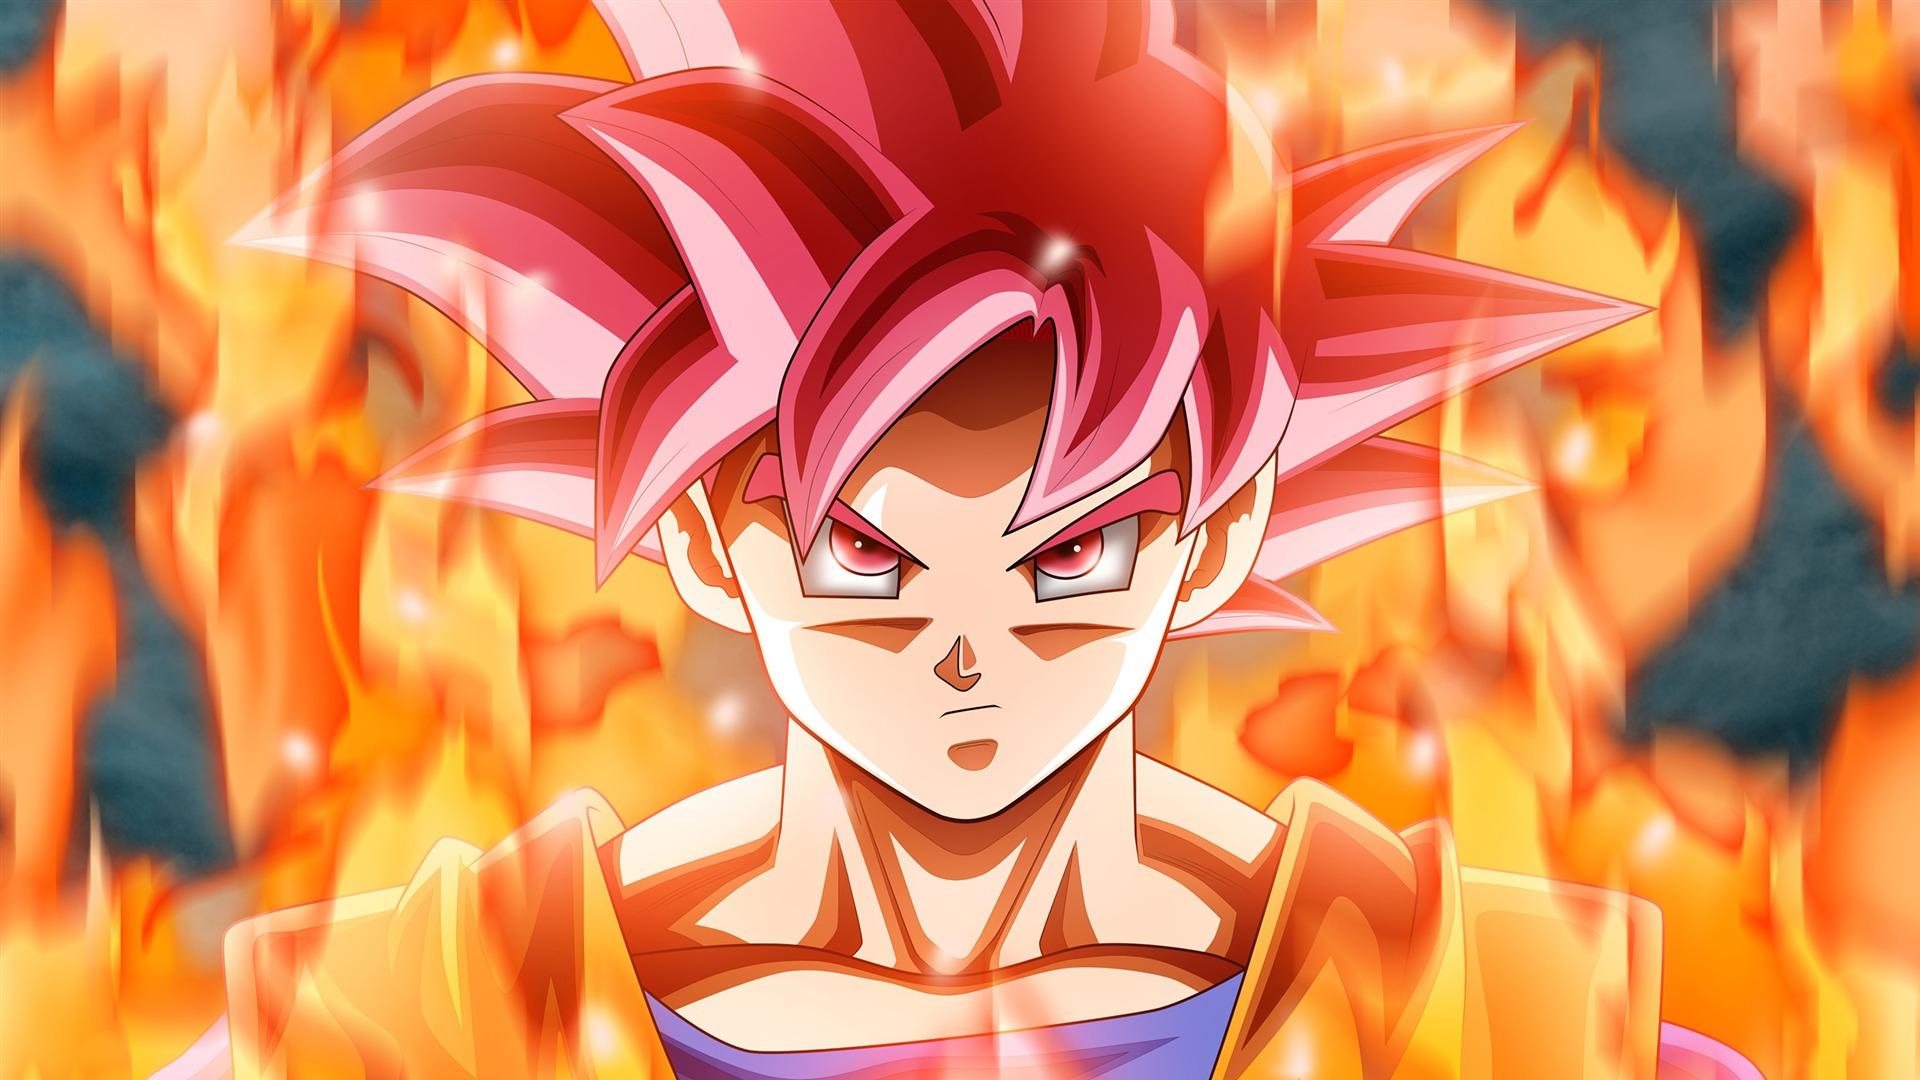 Dragon Ball Super Anime Design Hd Wallpaper 01 Avance